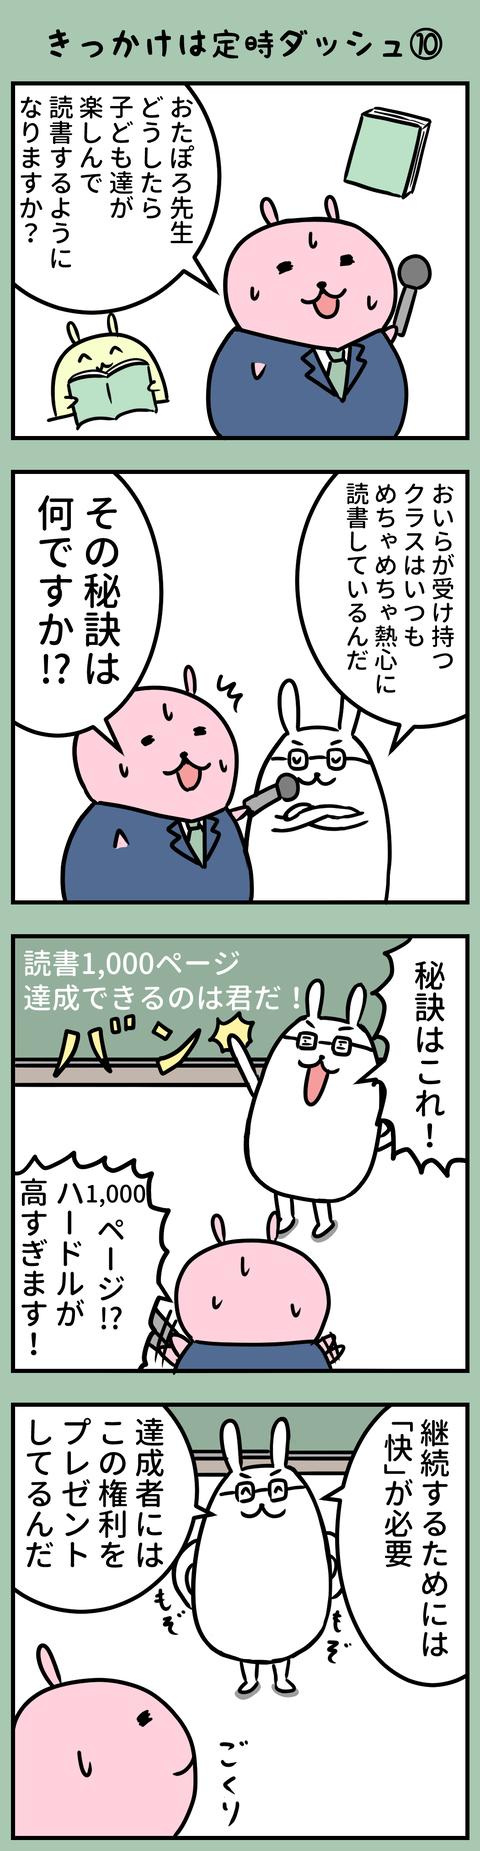 manga-yuzuporo58-1